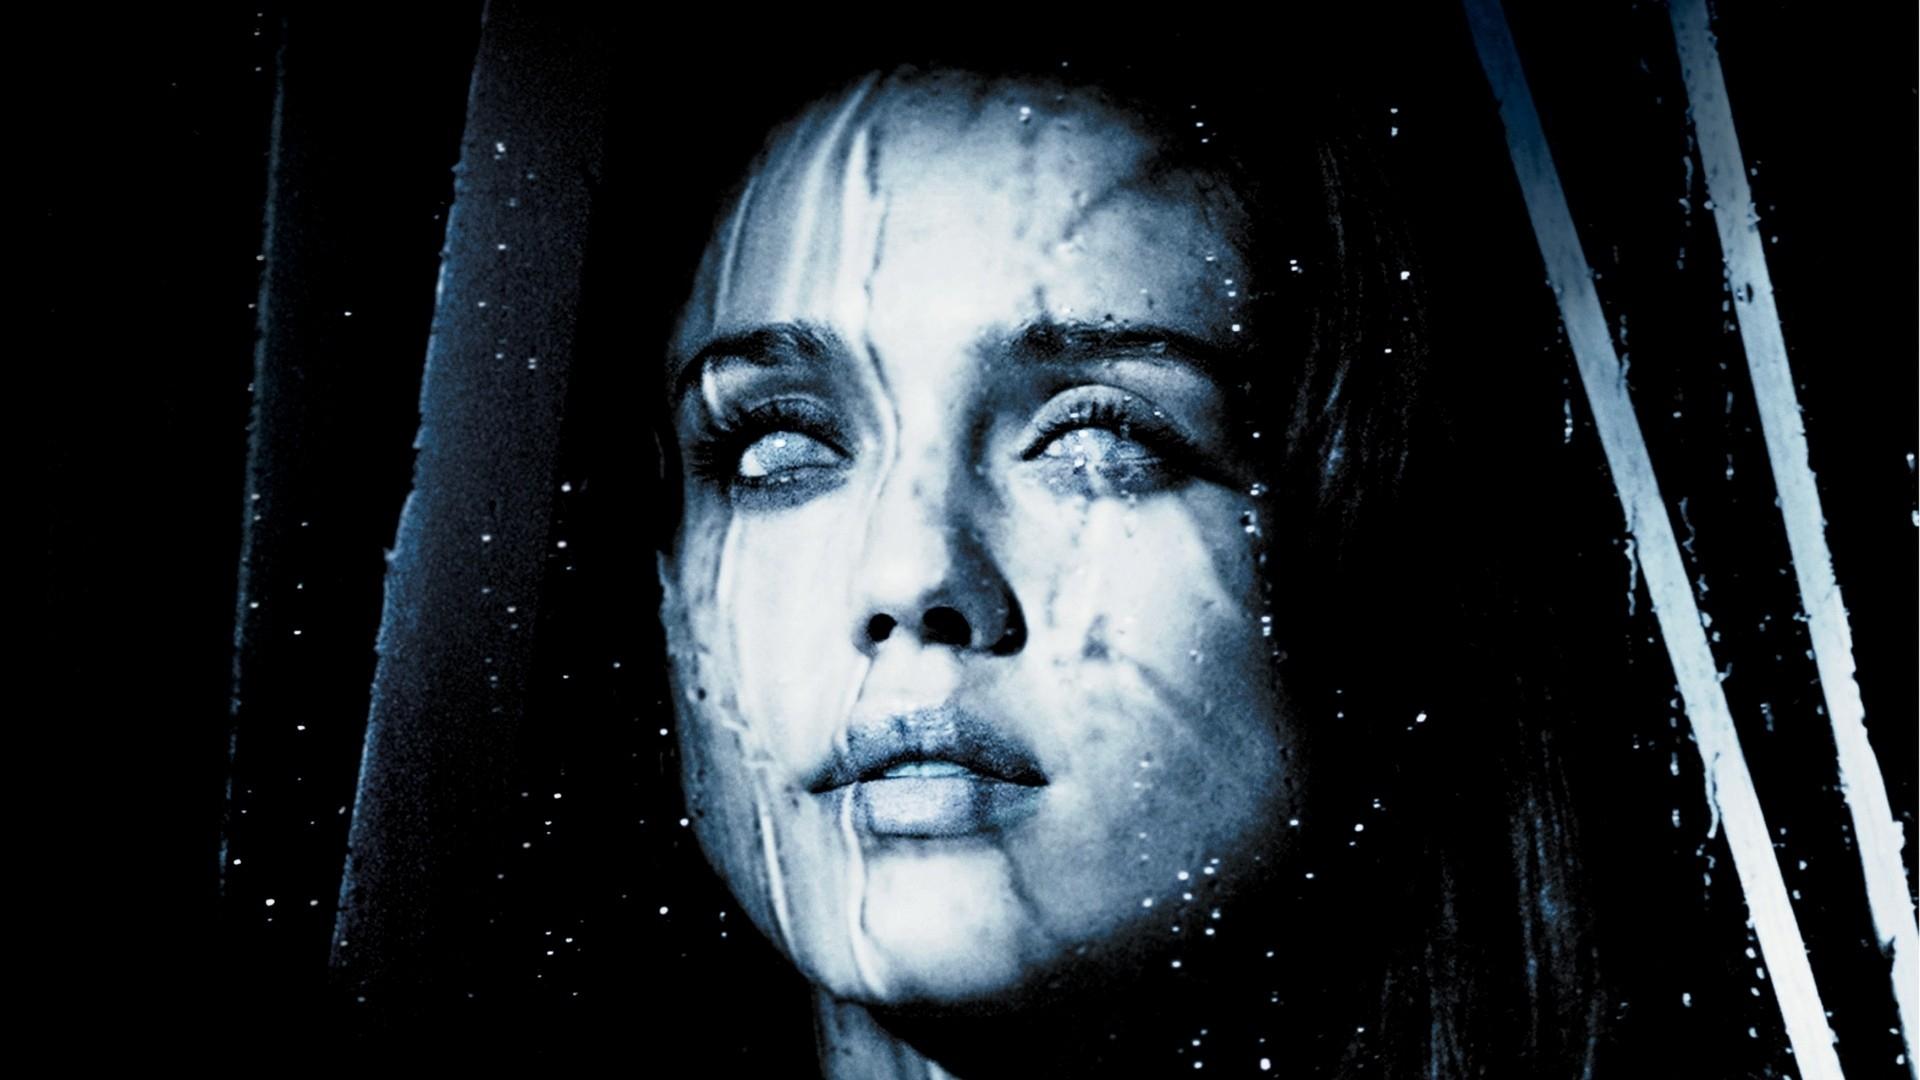 download wallpaper 1920x1080 the eye, face, girl, blind, sydney